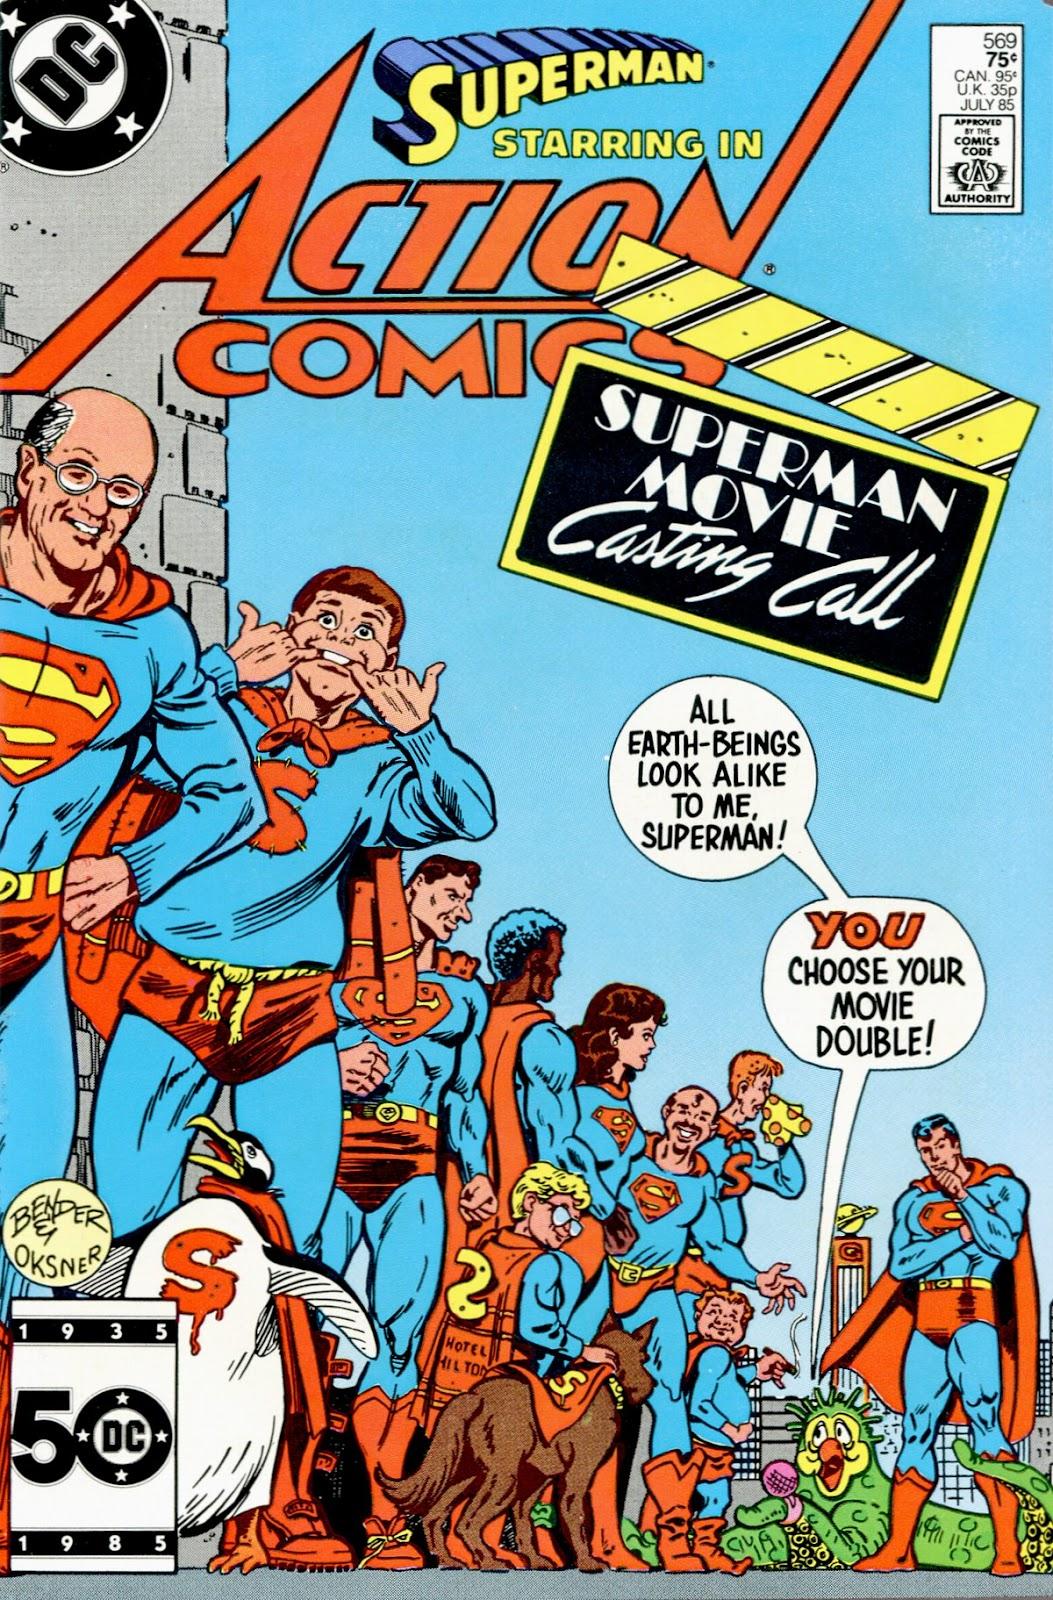 Action Comics (1938) 569 Page 1